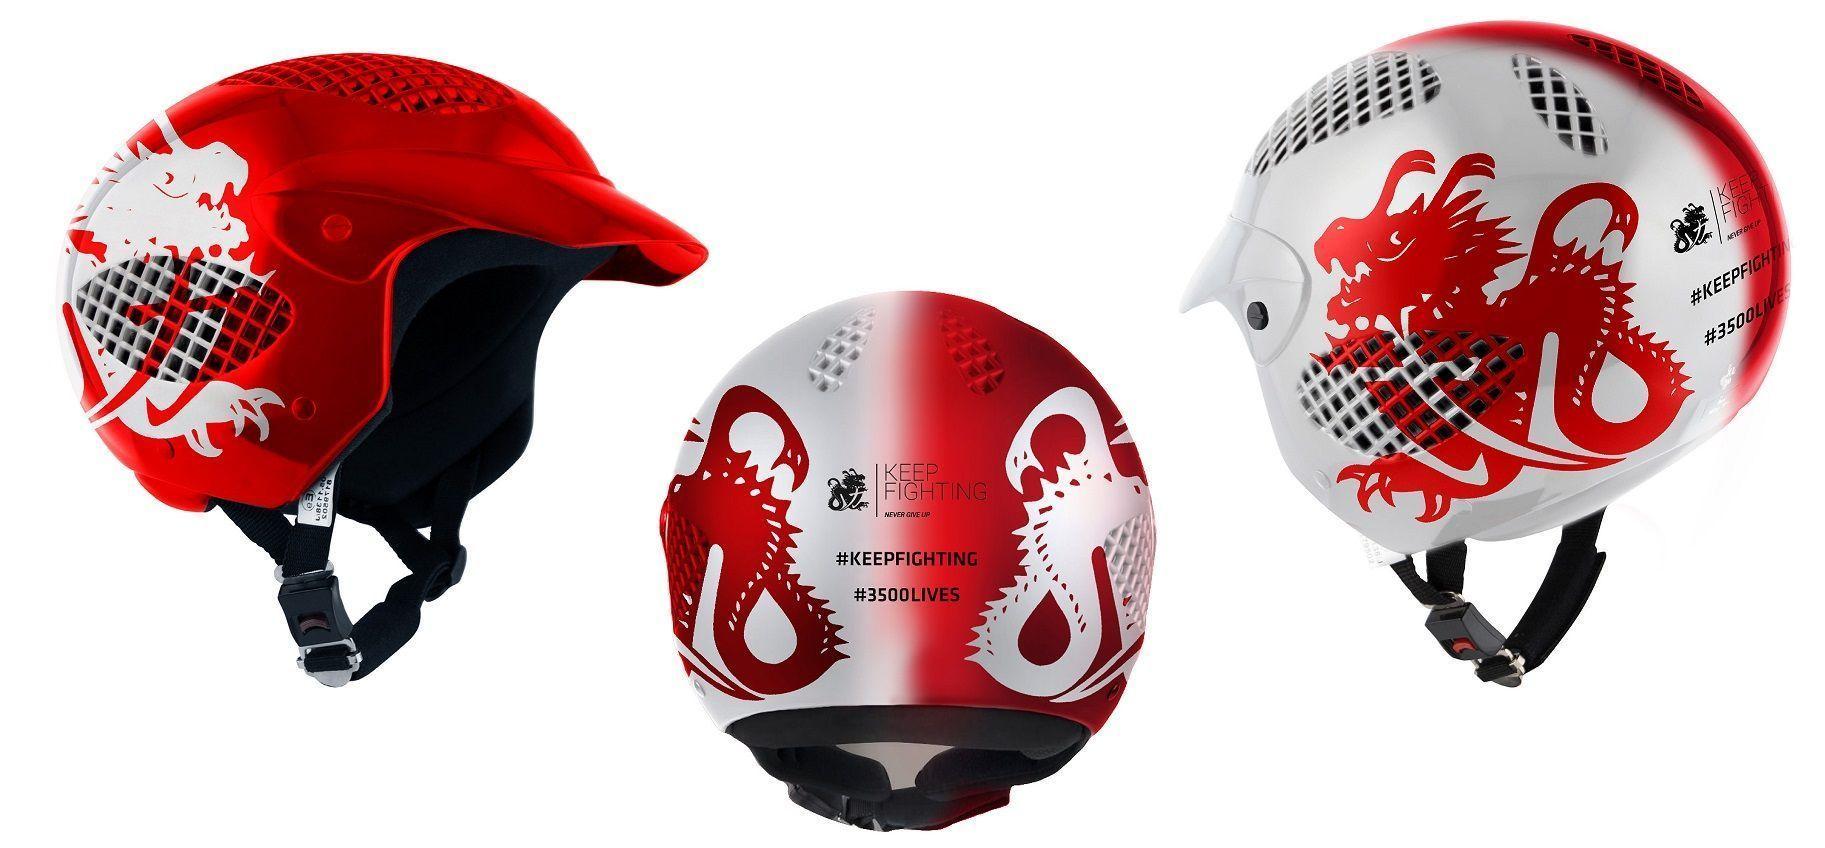 Michael Schumacher, FIA, Keep Fighting, F1 2020